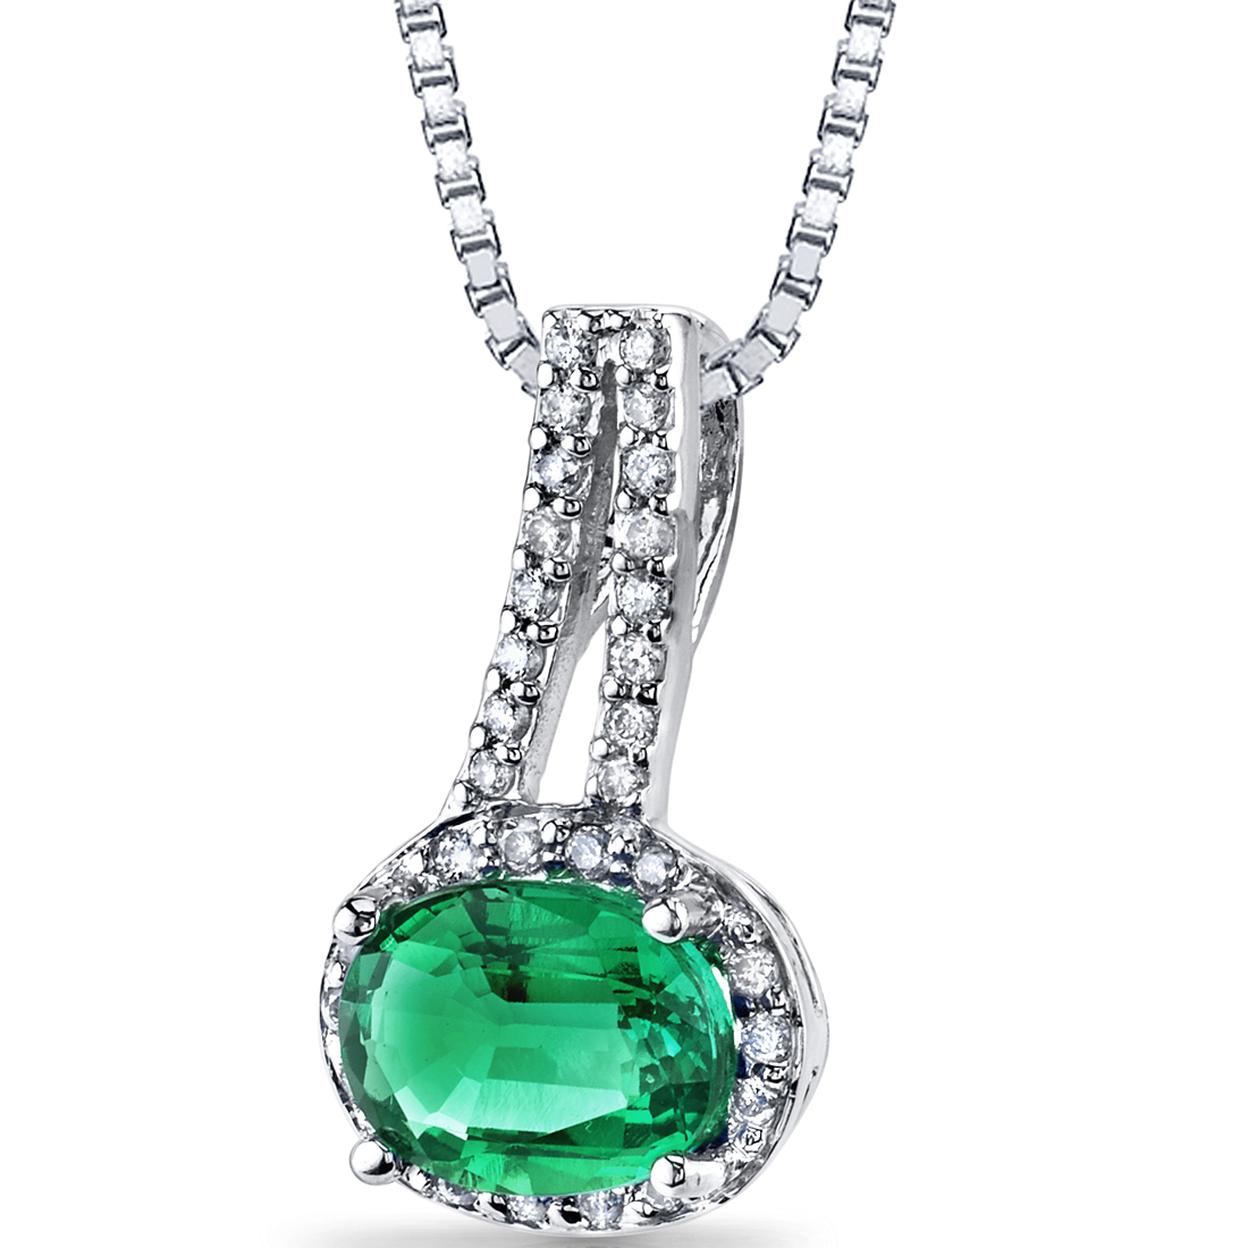 14k White Gold Created Emerald Diamond Pendant Oval Cut 1.25 Carats Total